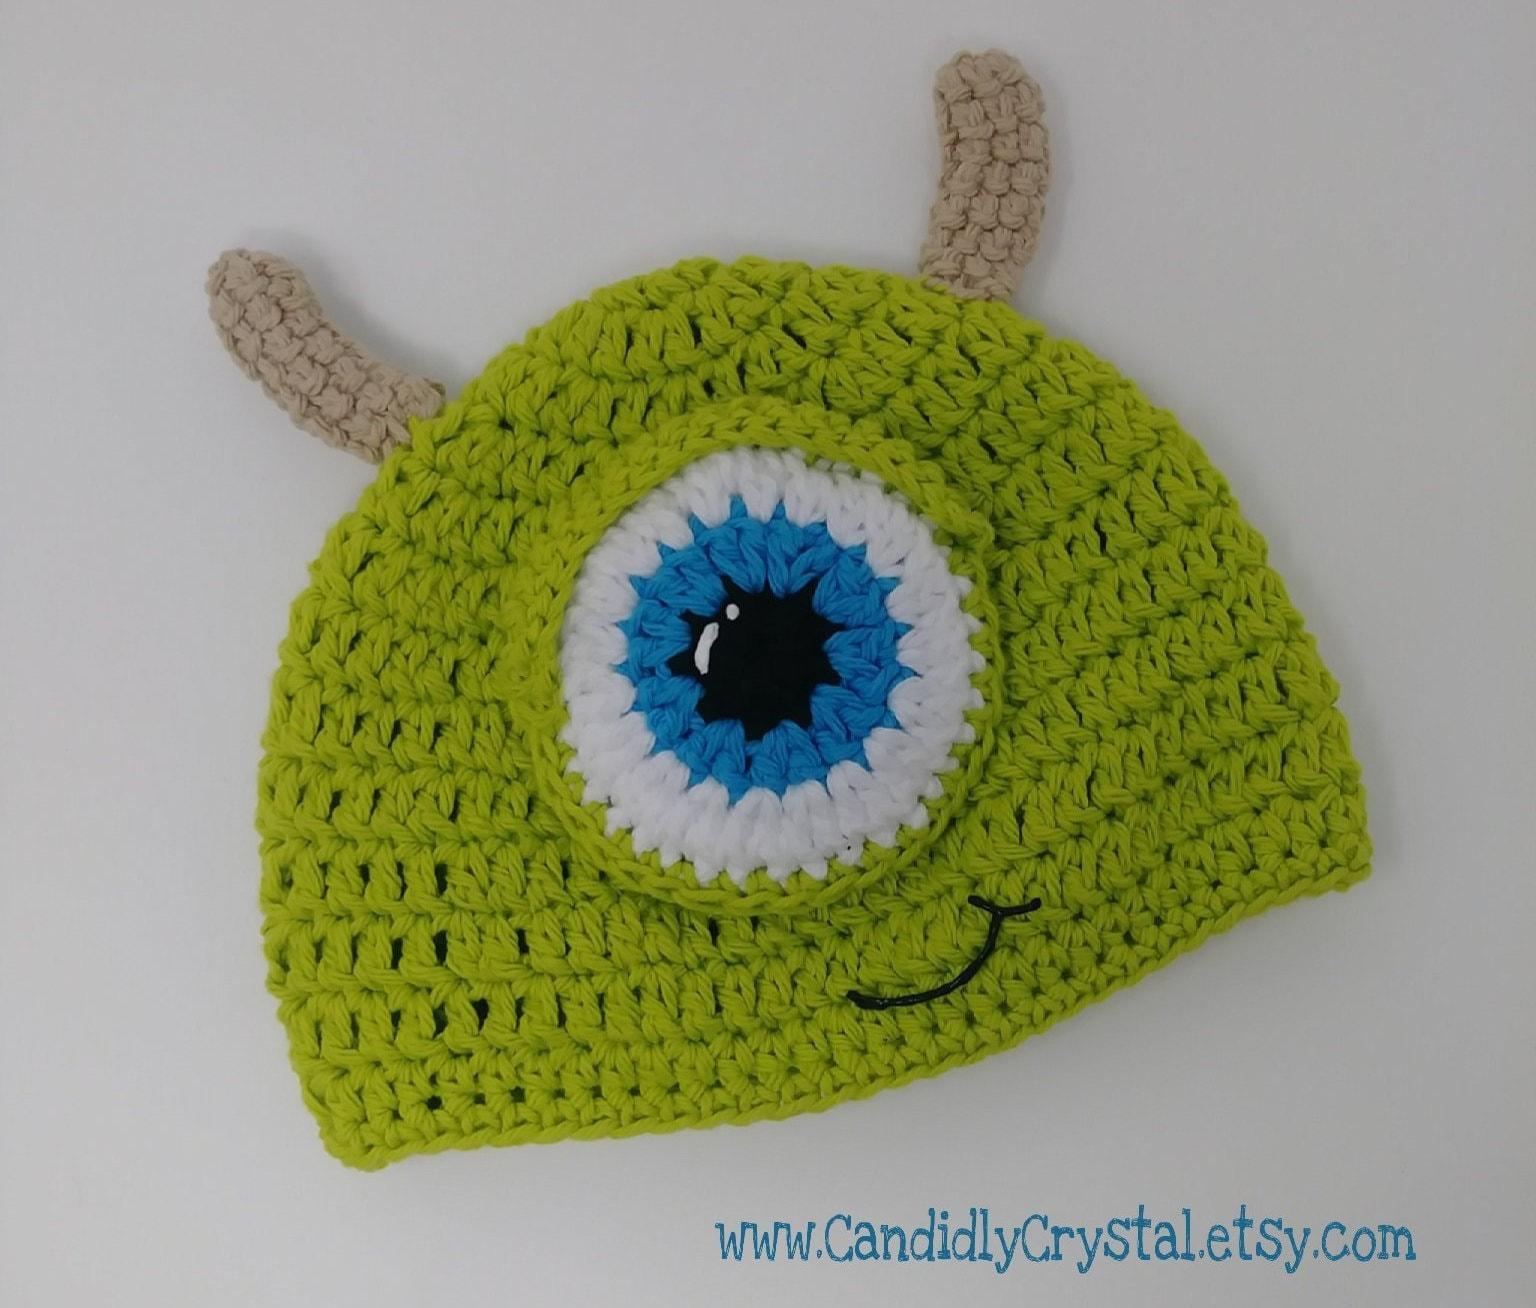 Mike Wazowski amigurumi crocheted by Гольцова Мария (maryandbaby ... | 1308x1536